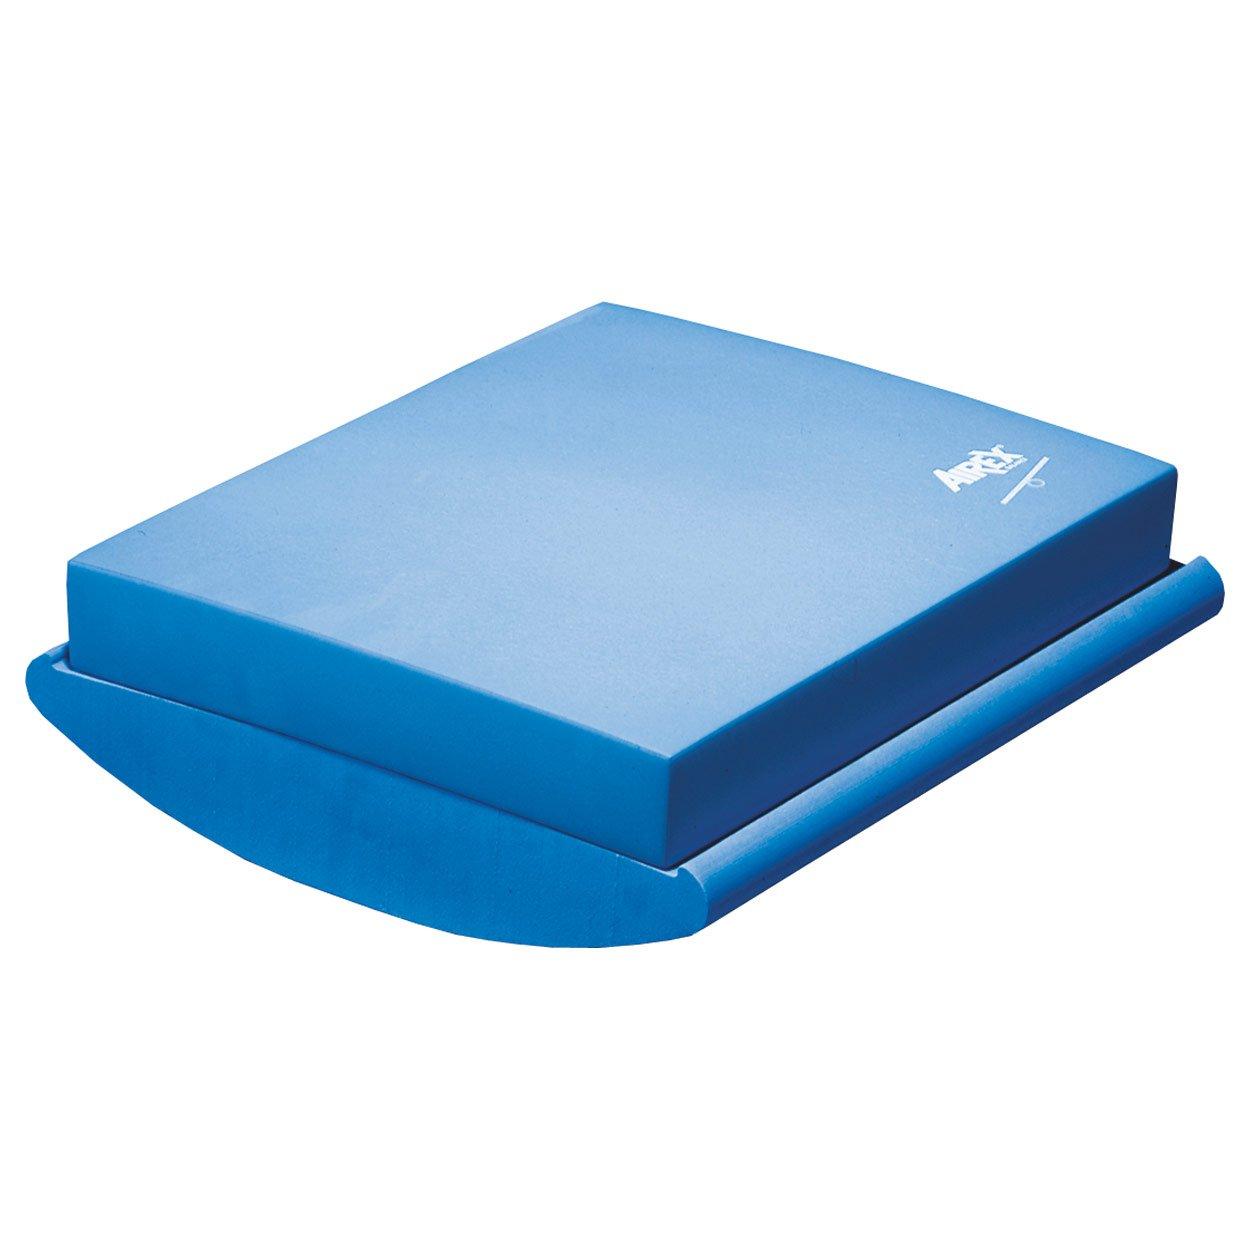 AIREX Balance Pad Standard inkl Koordinationswippe